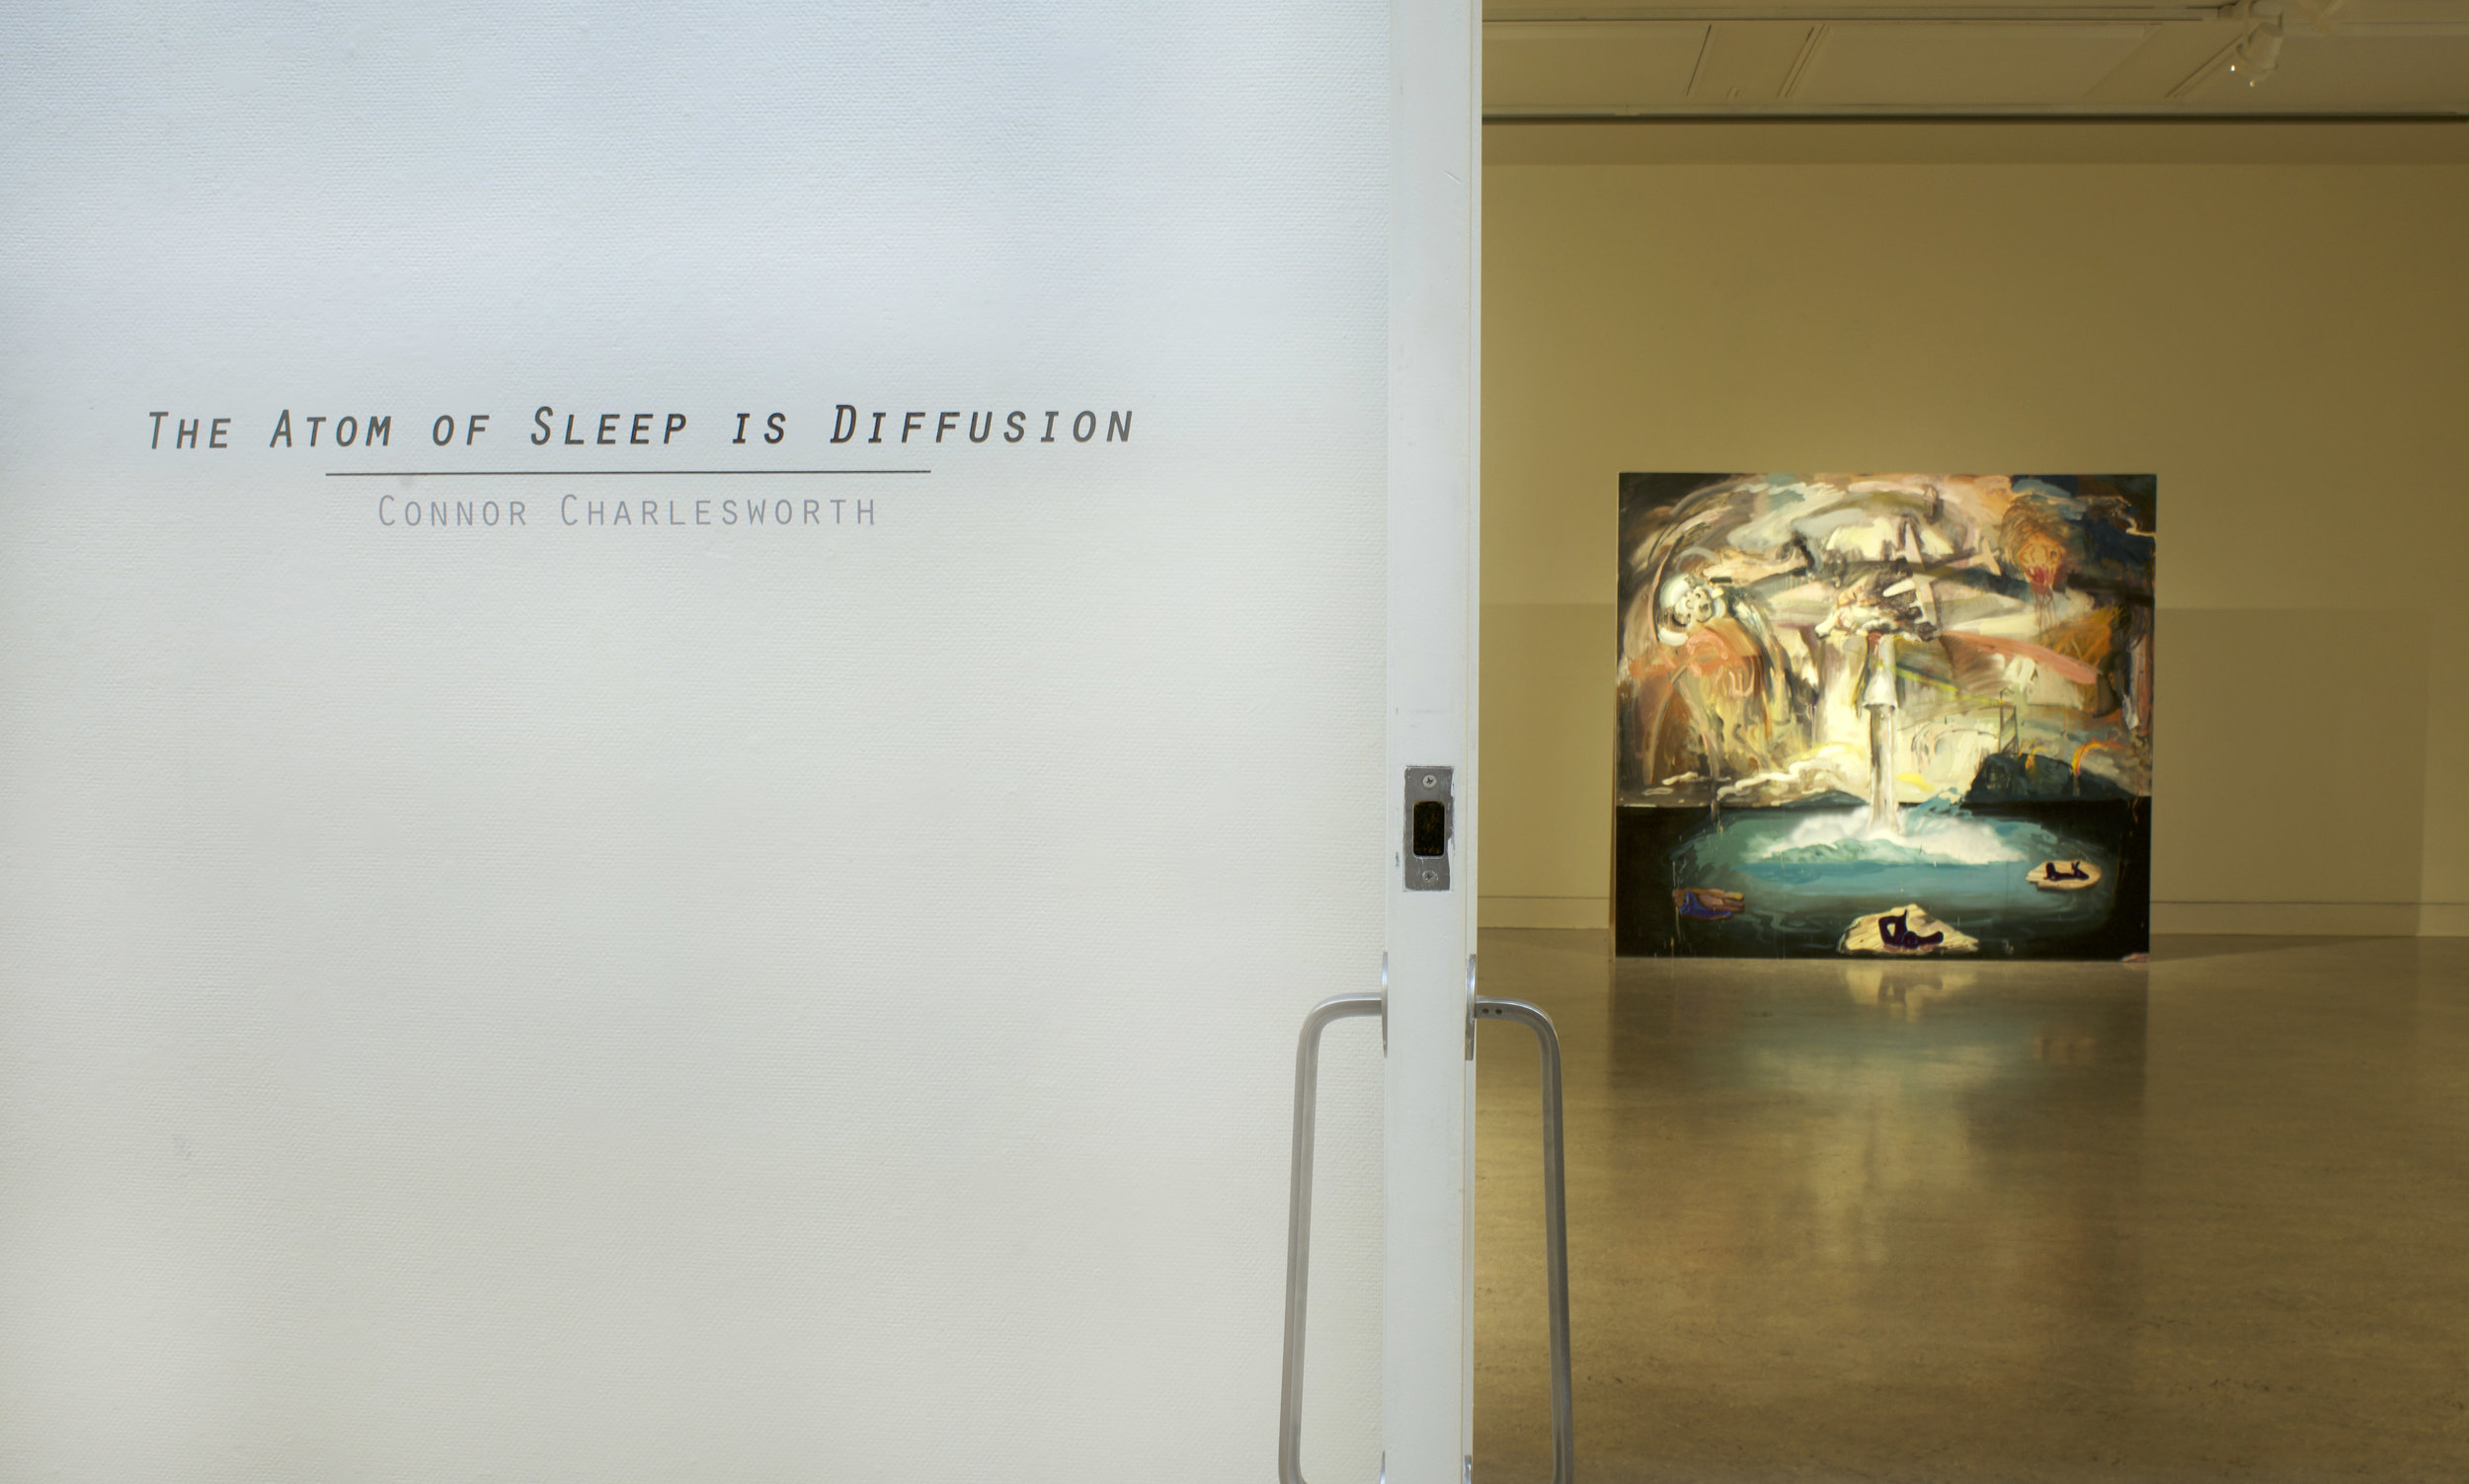 Installation Image: Audain Gallery, University of Victoria, 2018